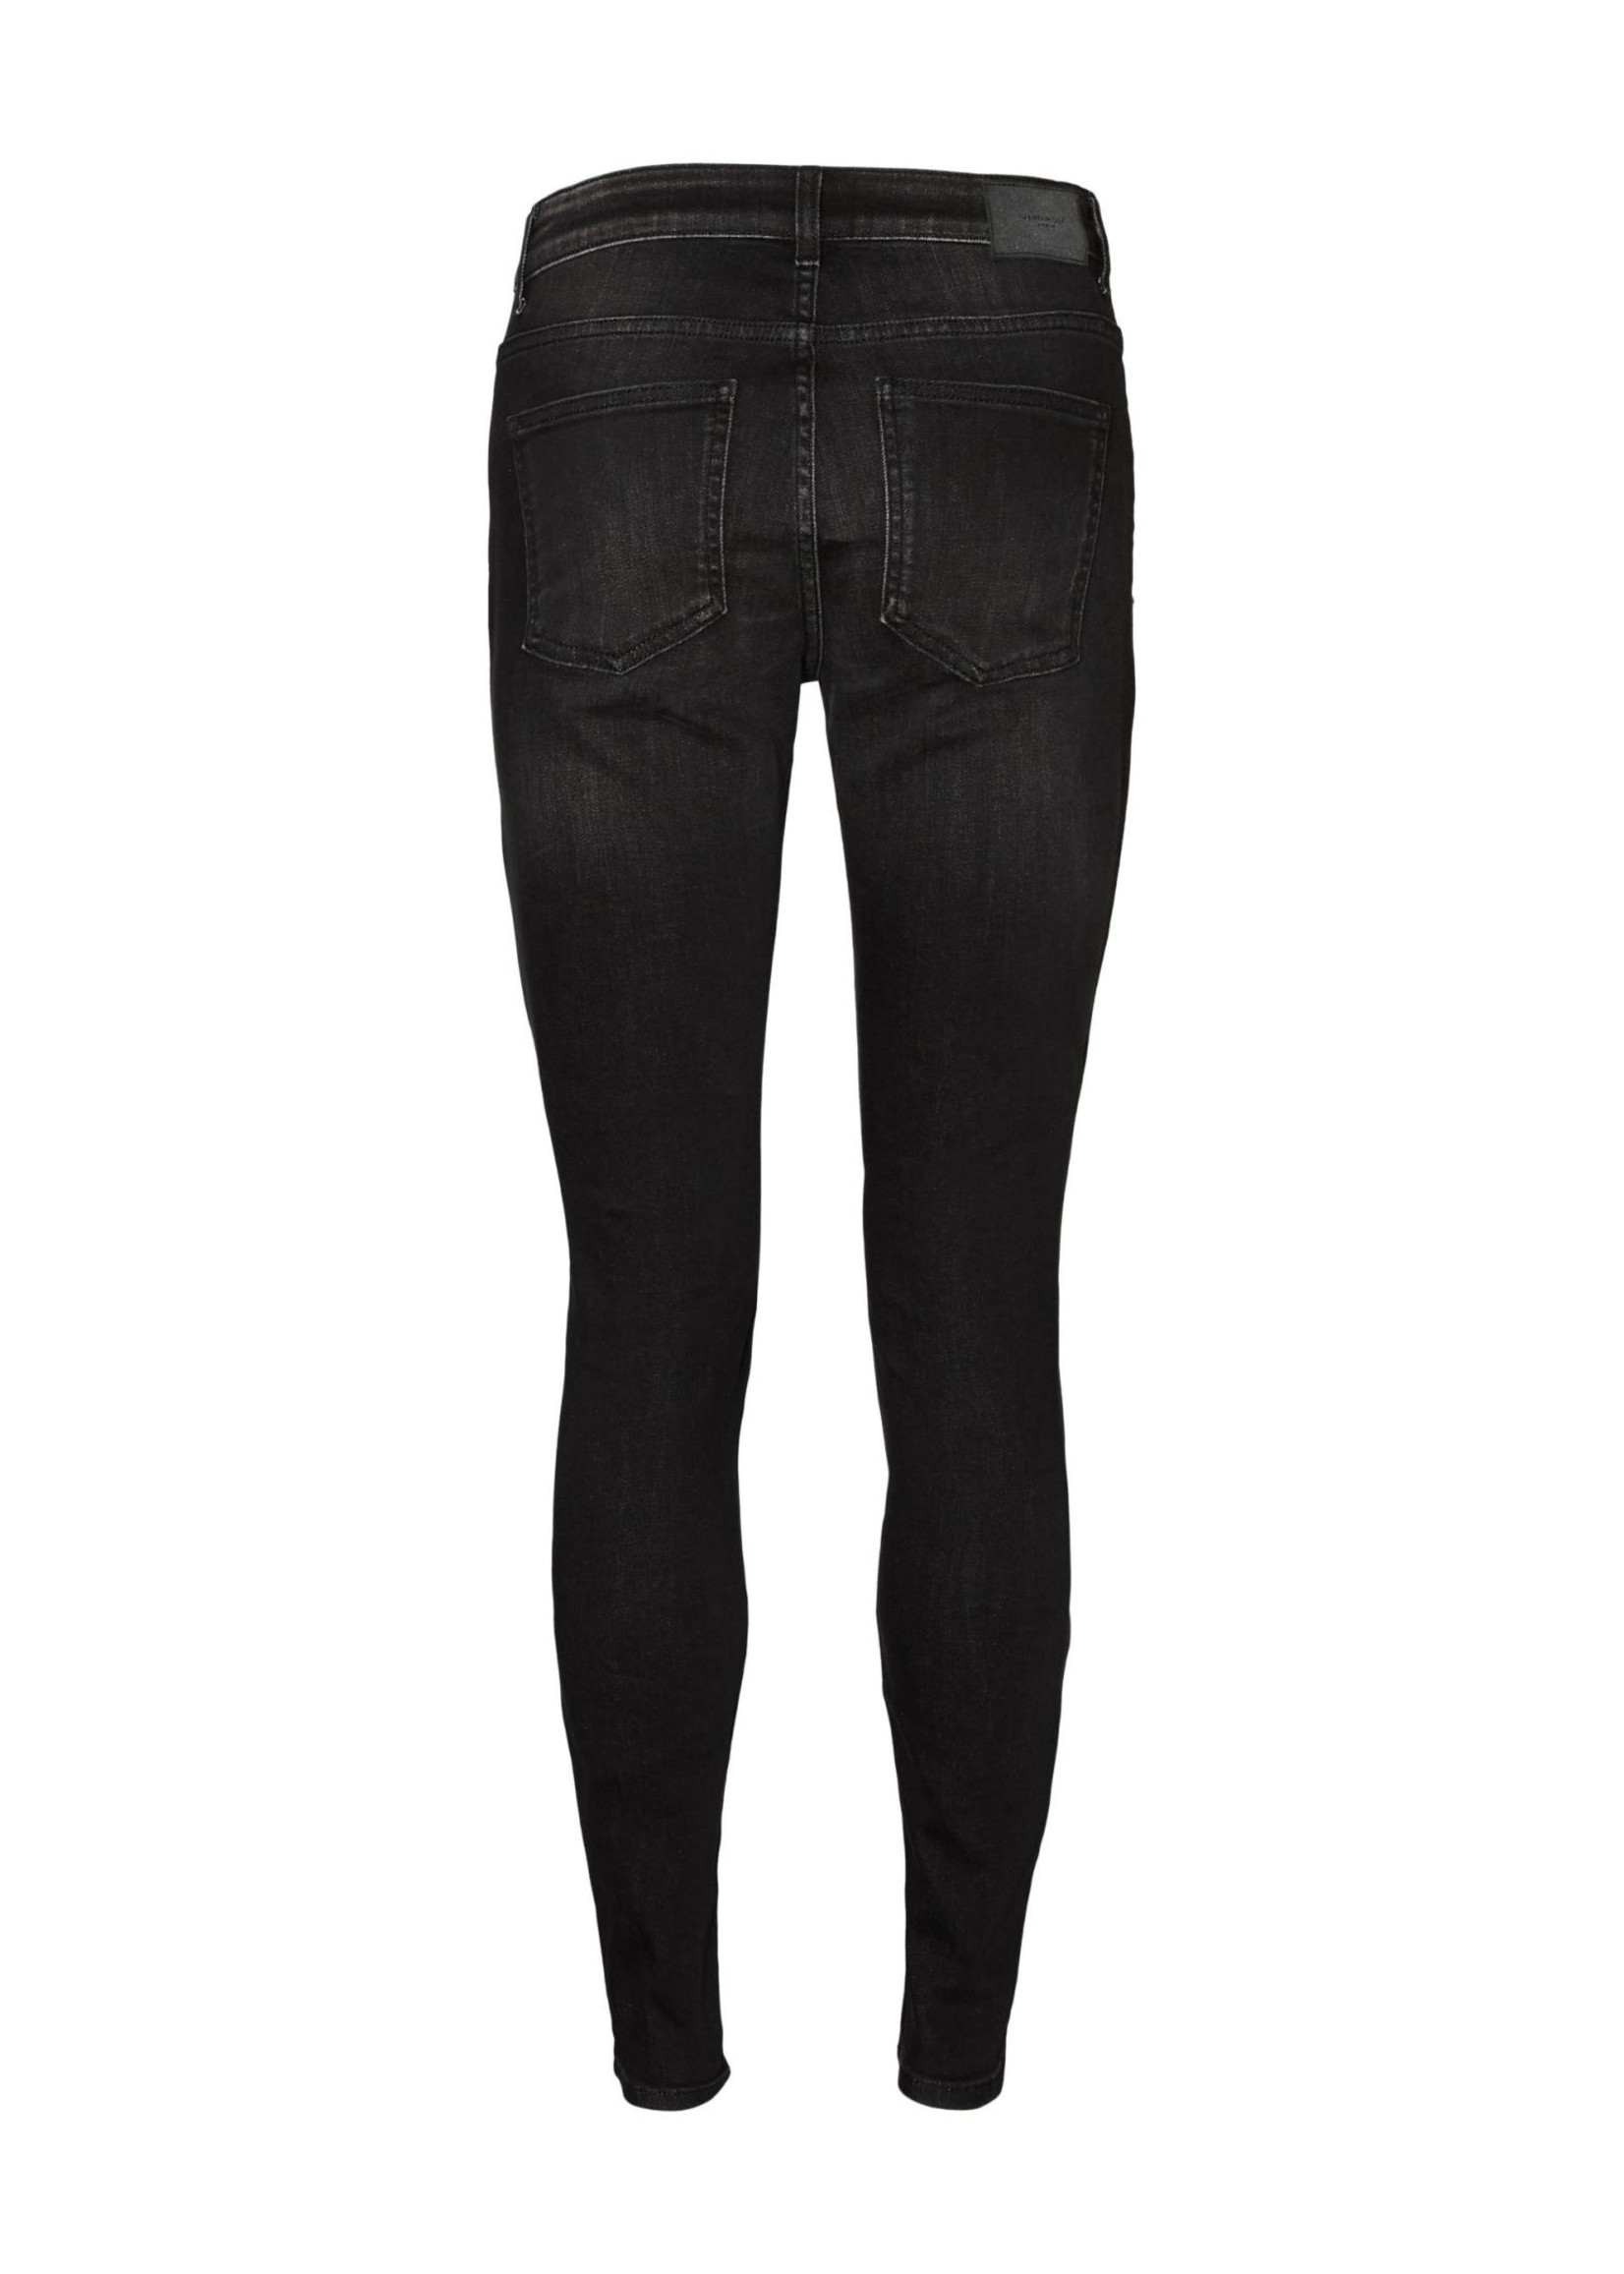 VERO MODA Ella MR Slim jeans Black